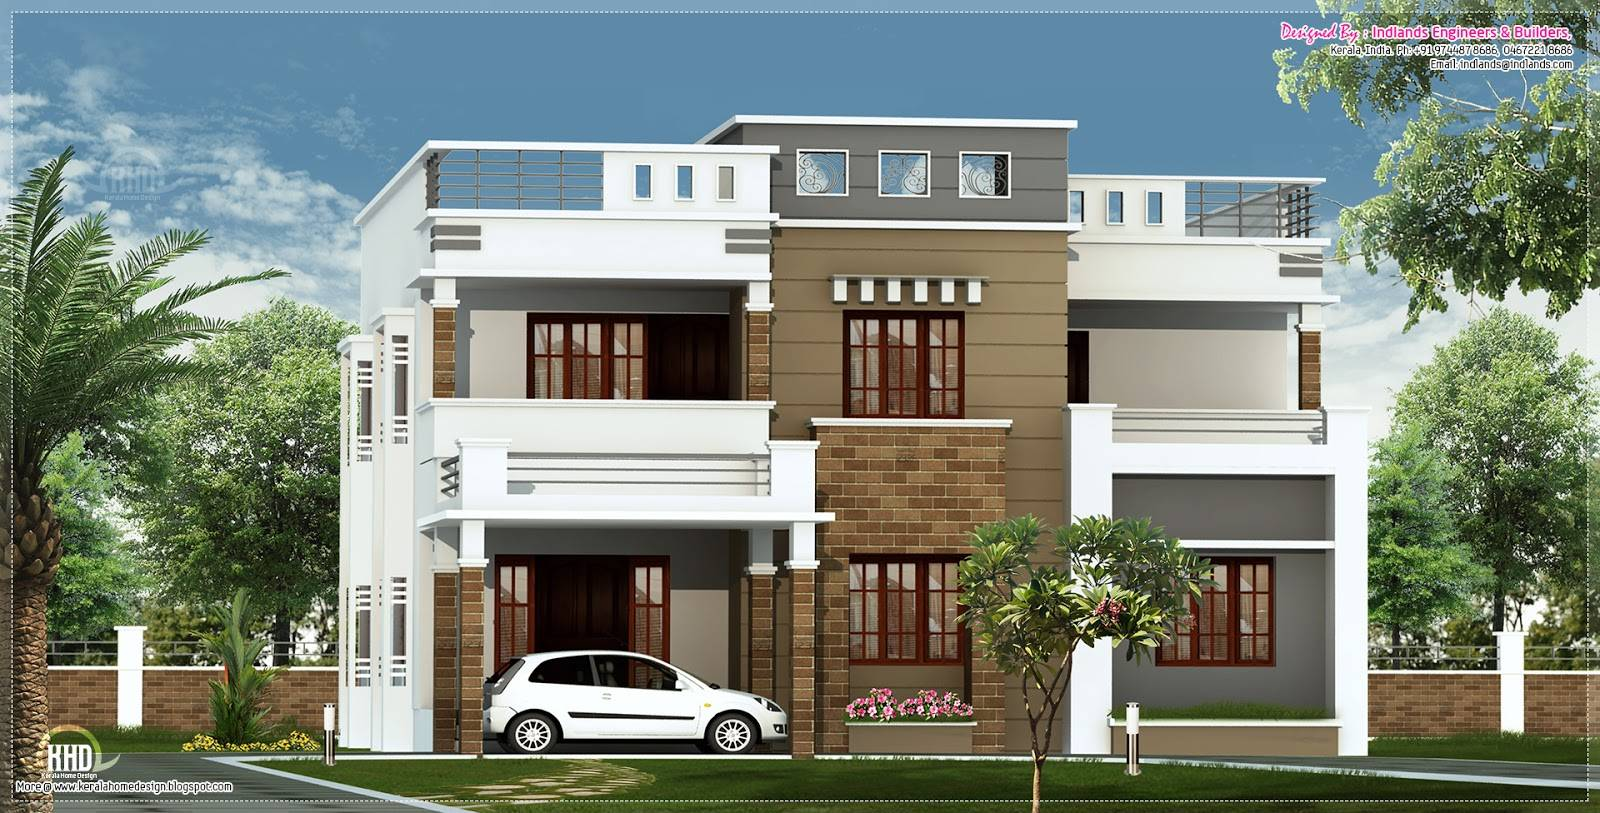 Feet Flat Roof Villa Elevation Kerala Home Design Floor Plans Home Plans Blueprints 39771